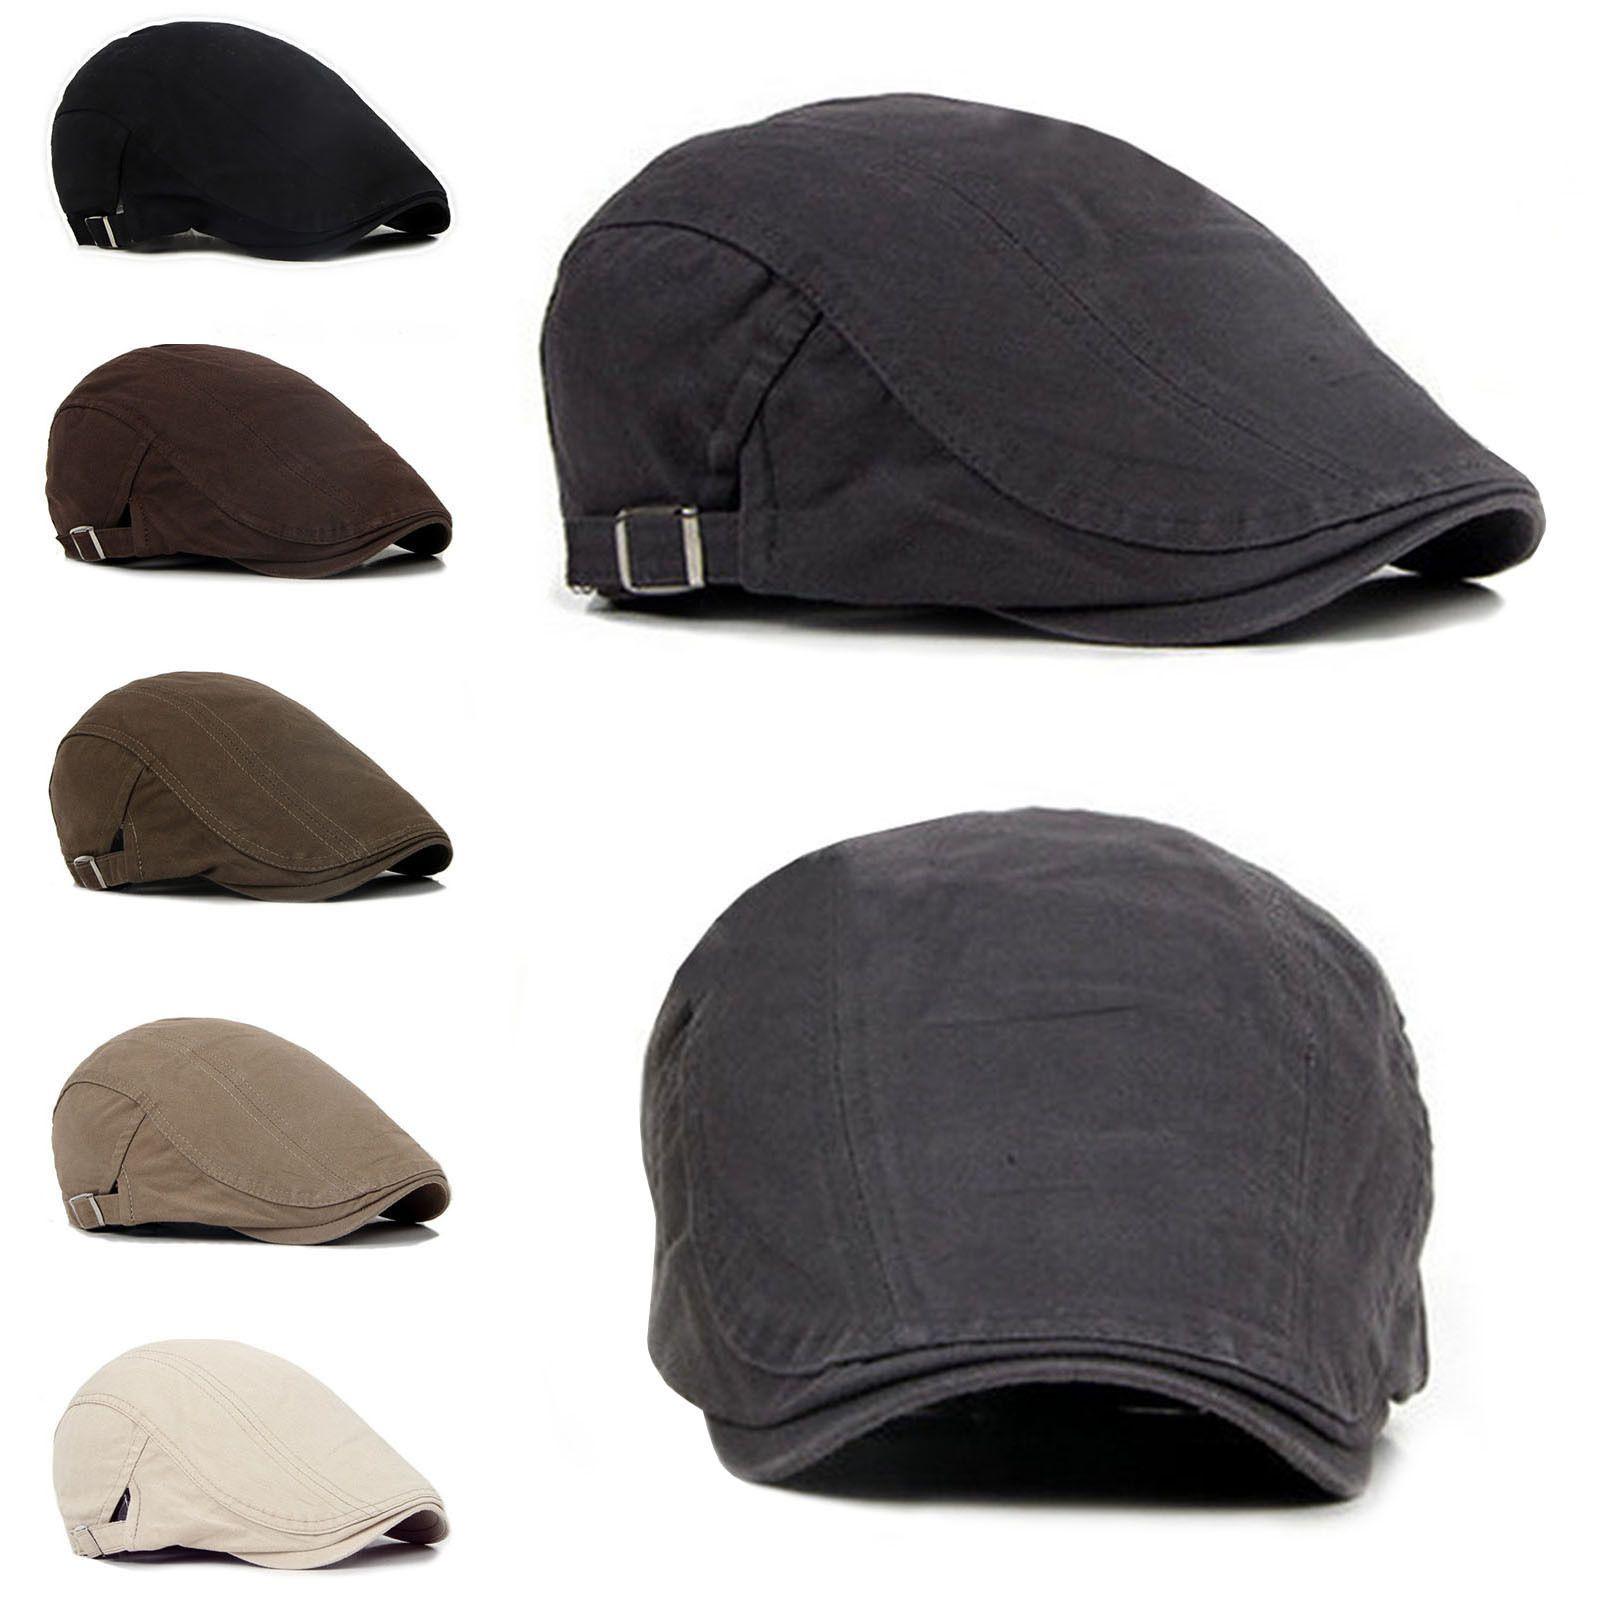 fa20e268434  4.96 - Men s Ivy Hat Berets Cap Golf Driving Sun Flat Cabbiesboy Cap-Fashion